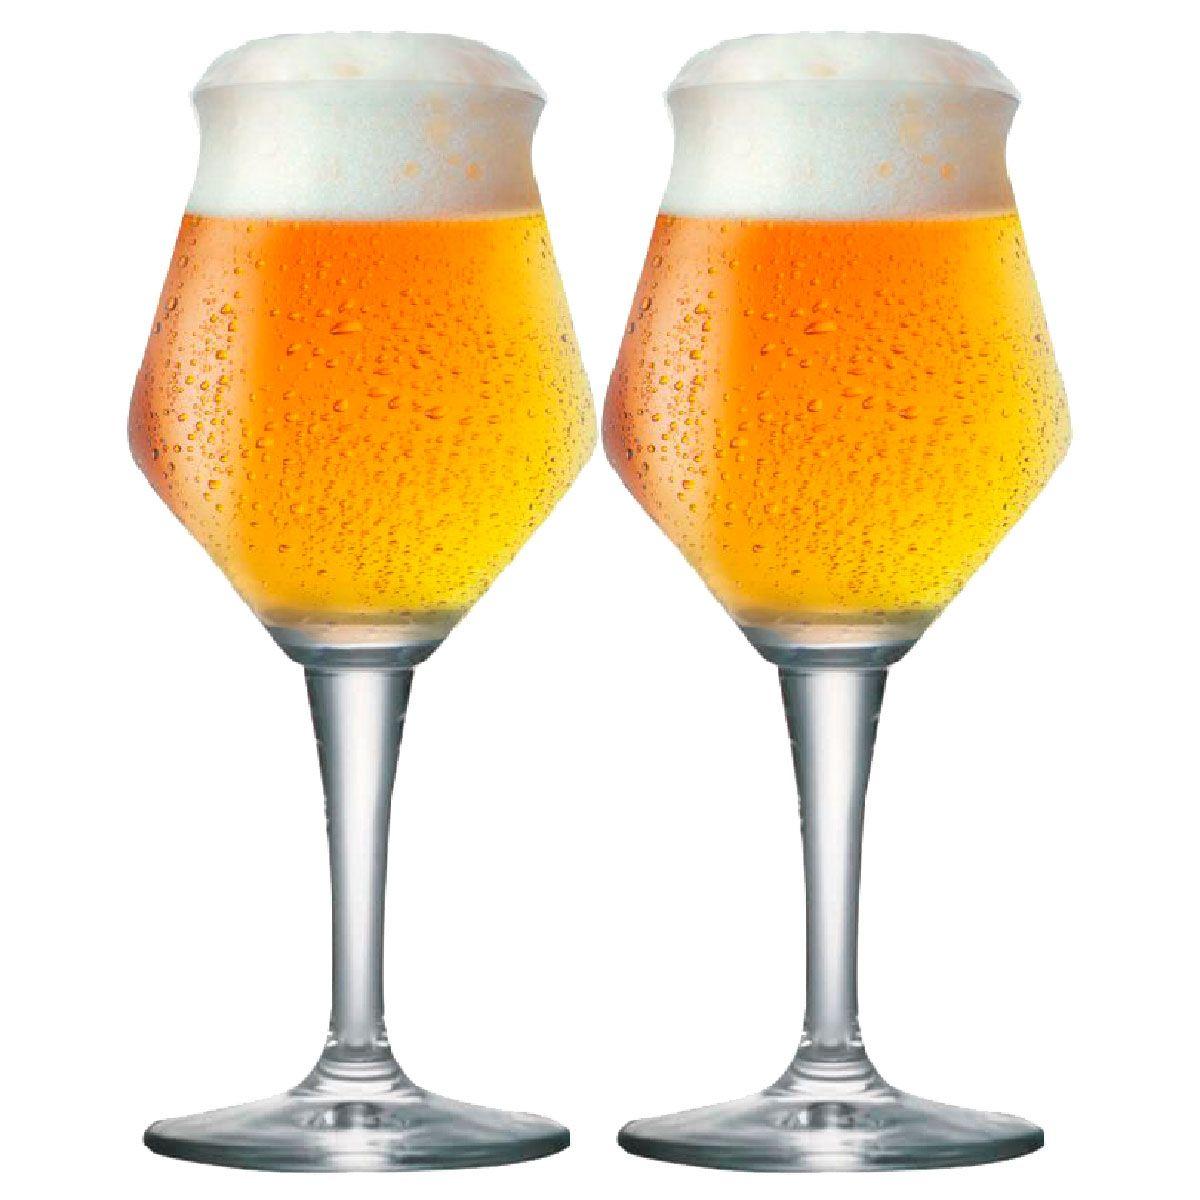 Jogo de Taça de Cerveja Crista Beer Sommelier Alta 430ml 2 Pcs